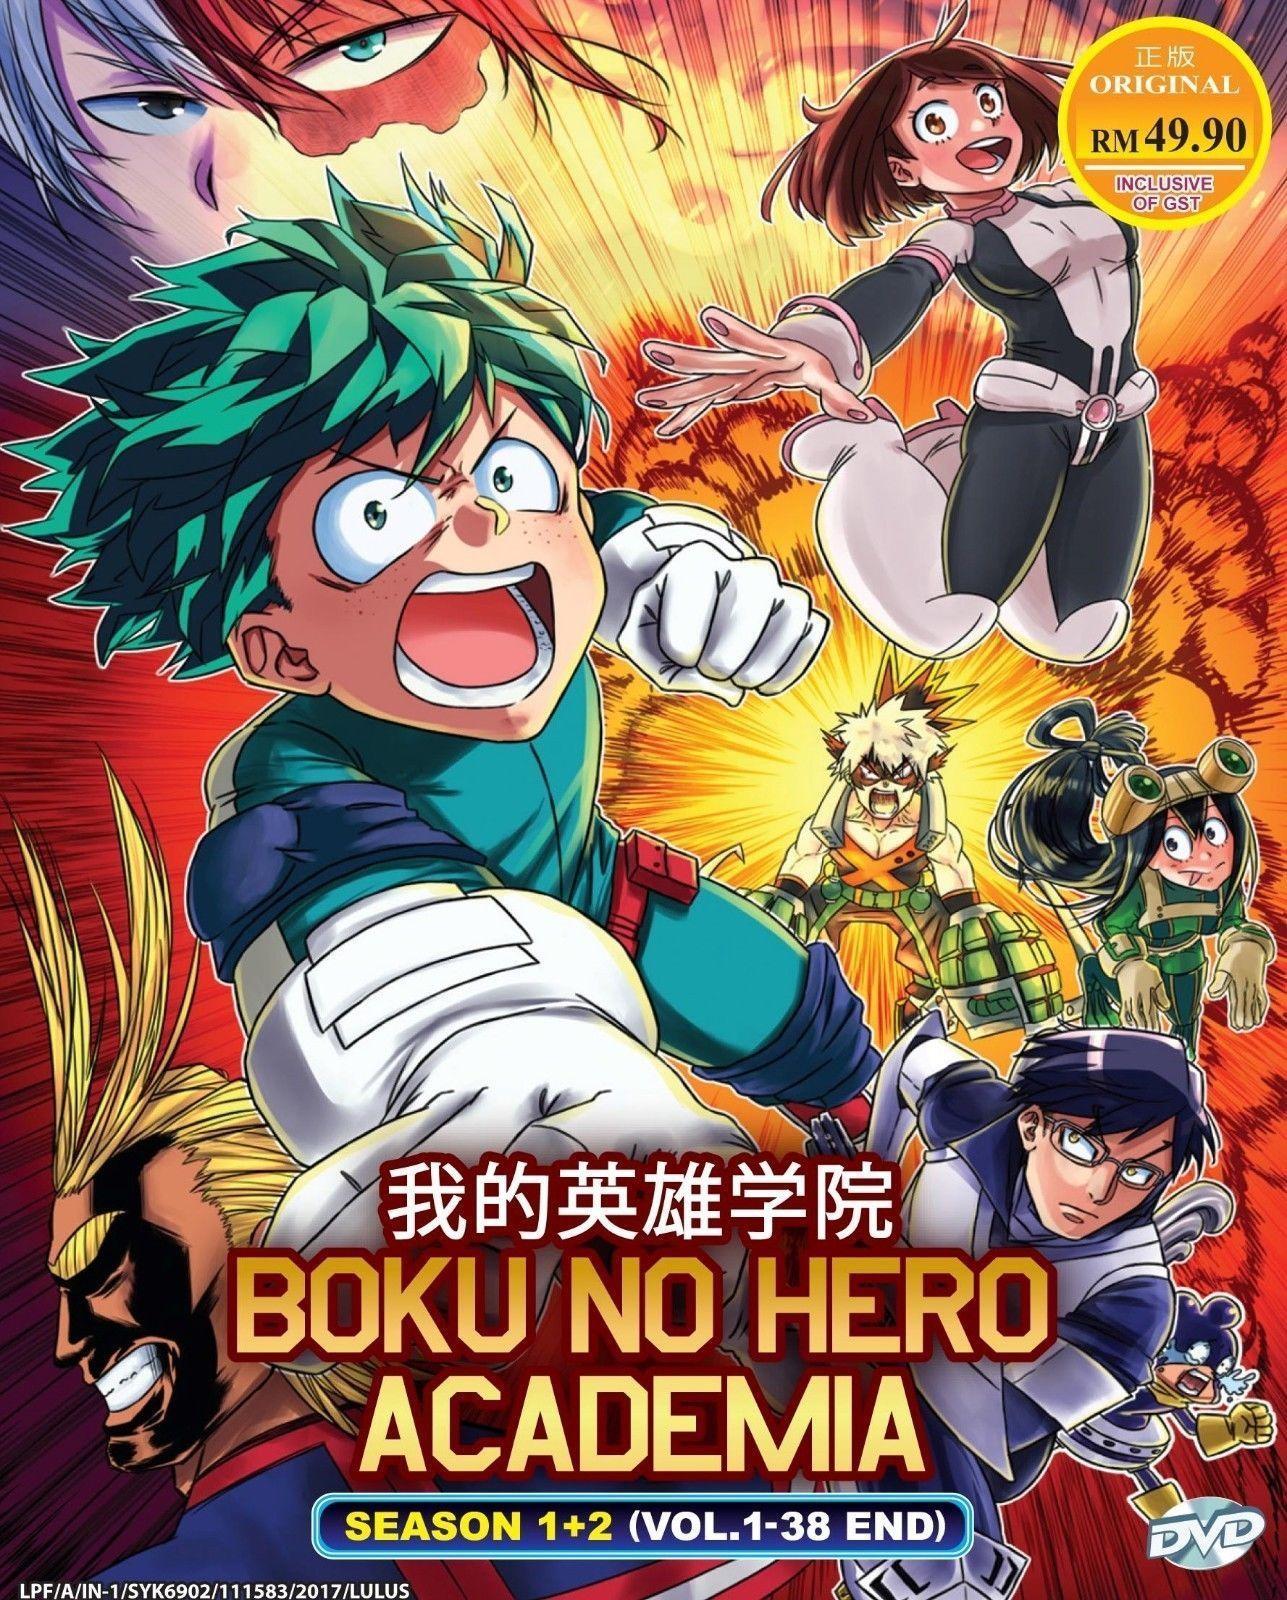 Dvd Japan Anime Boku No Hero Academia Series Season 1+2 (1